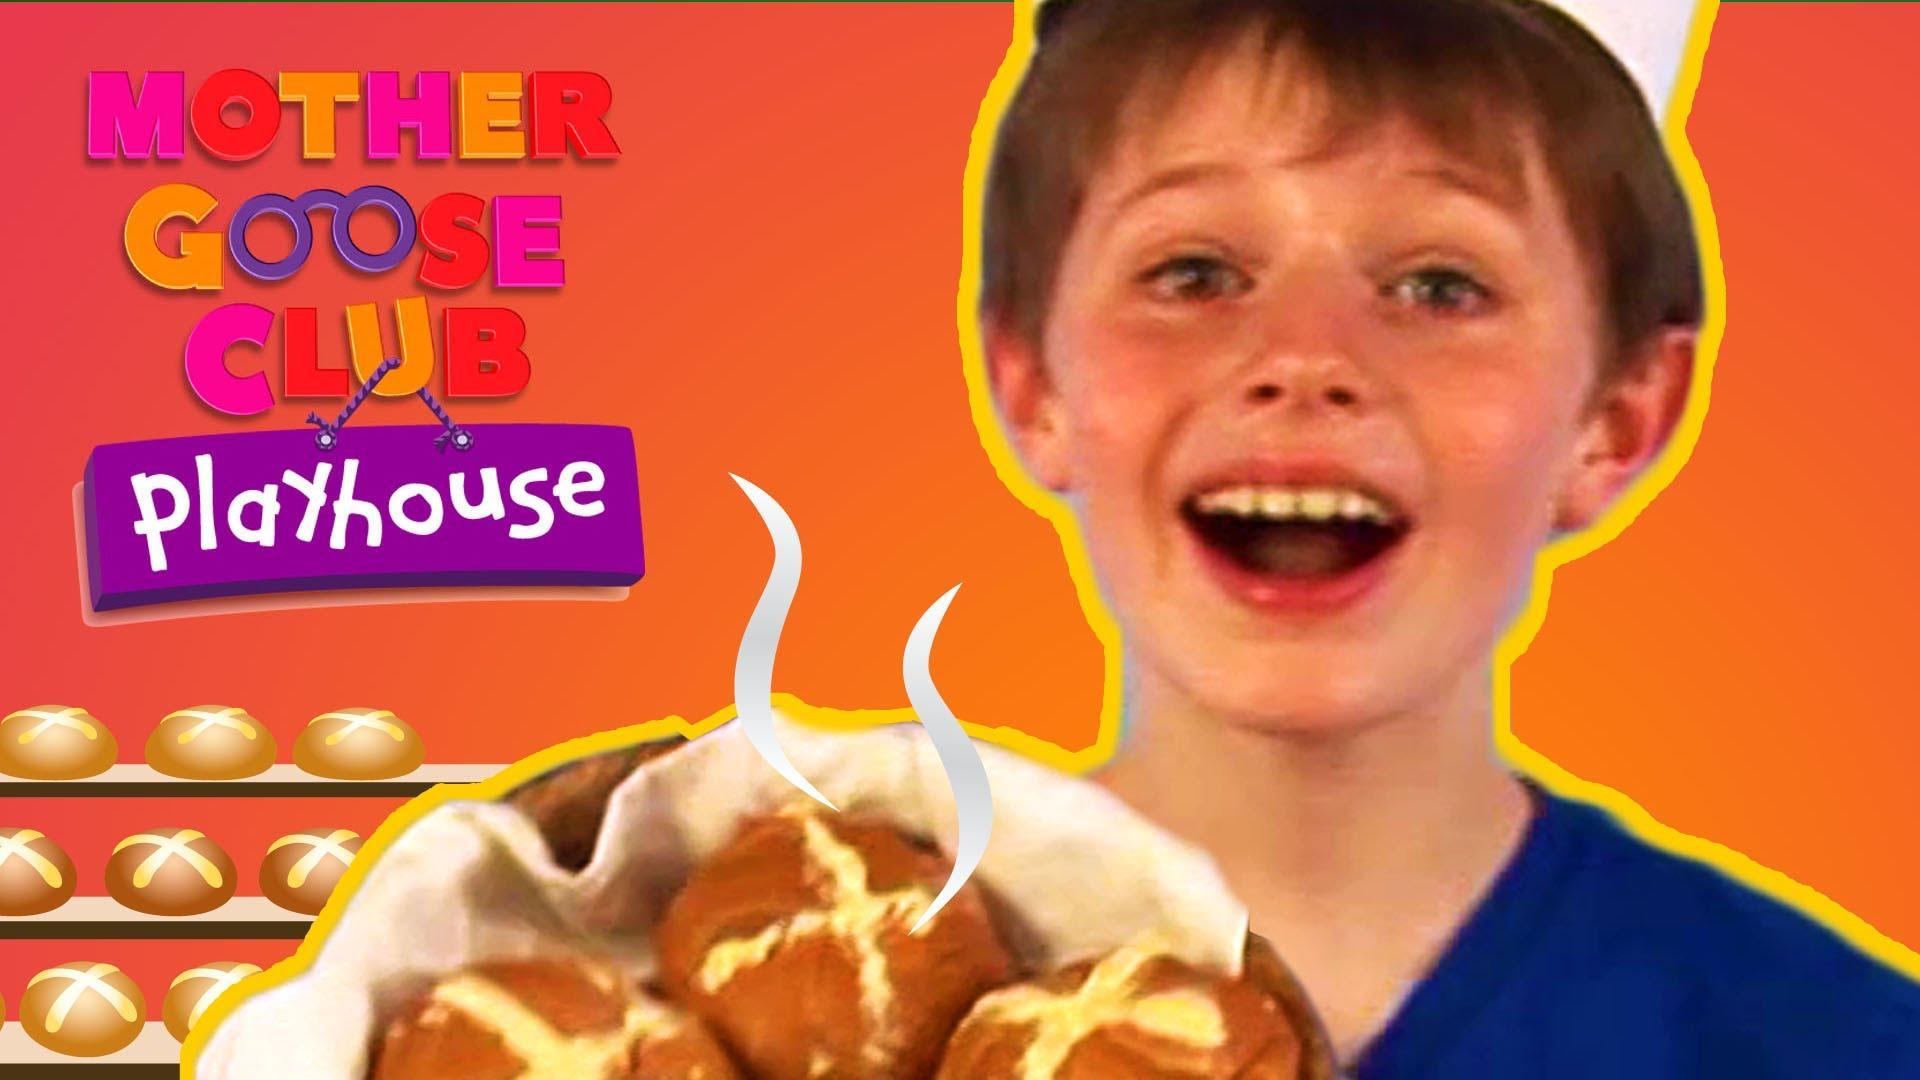 Hot Cross Buns! – Mother Goose Club Playhouse Kids Video